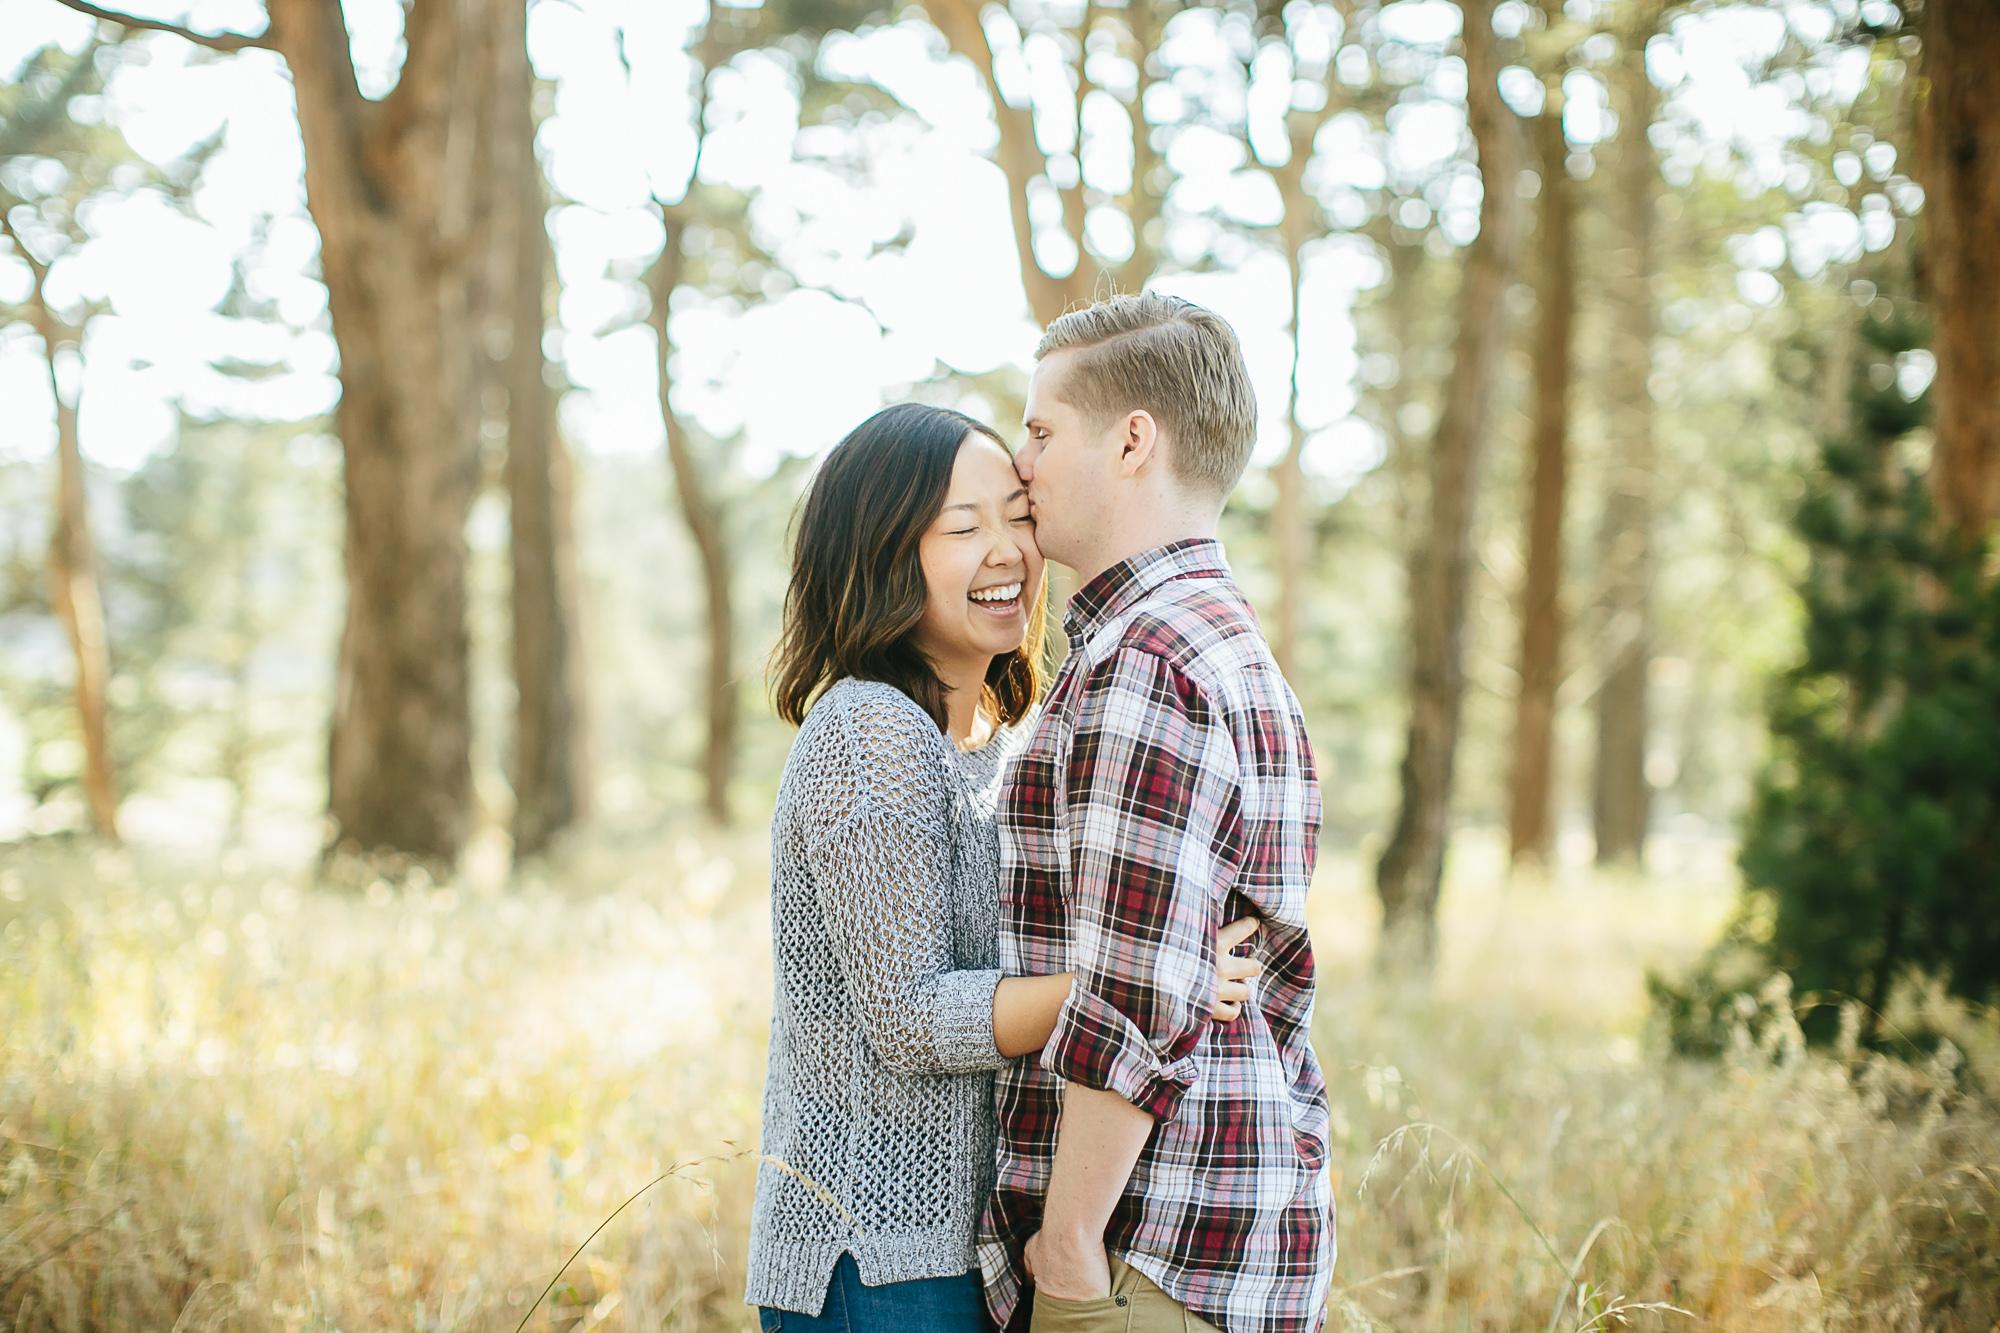 Jenni+Kyle-BLOG_KELLYBOITANO_WEB-9